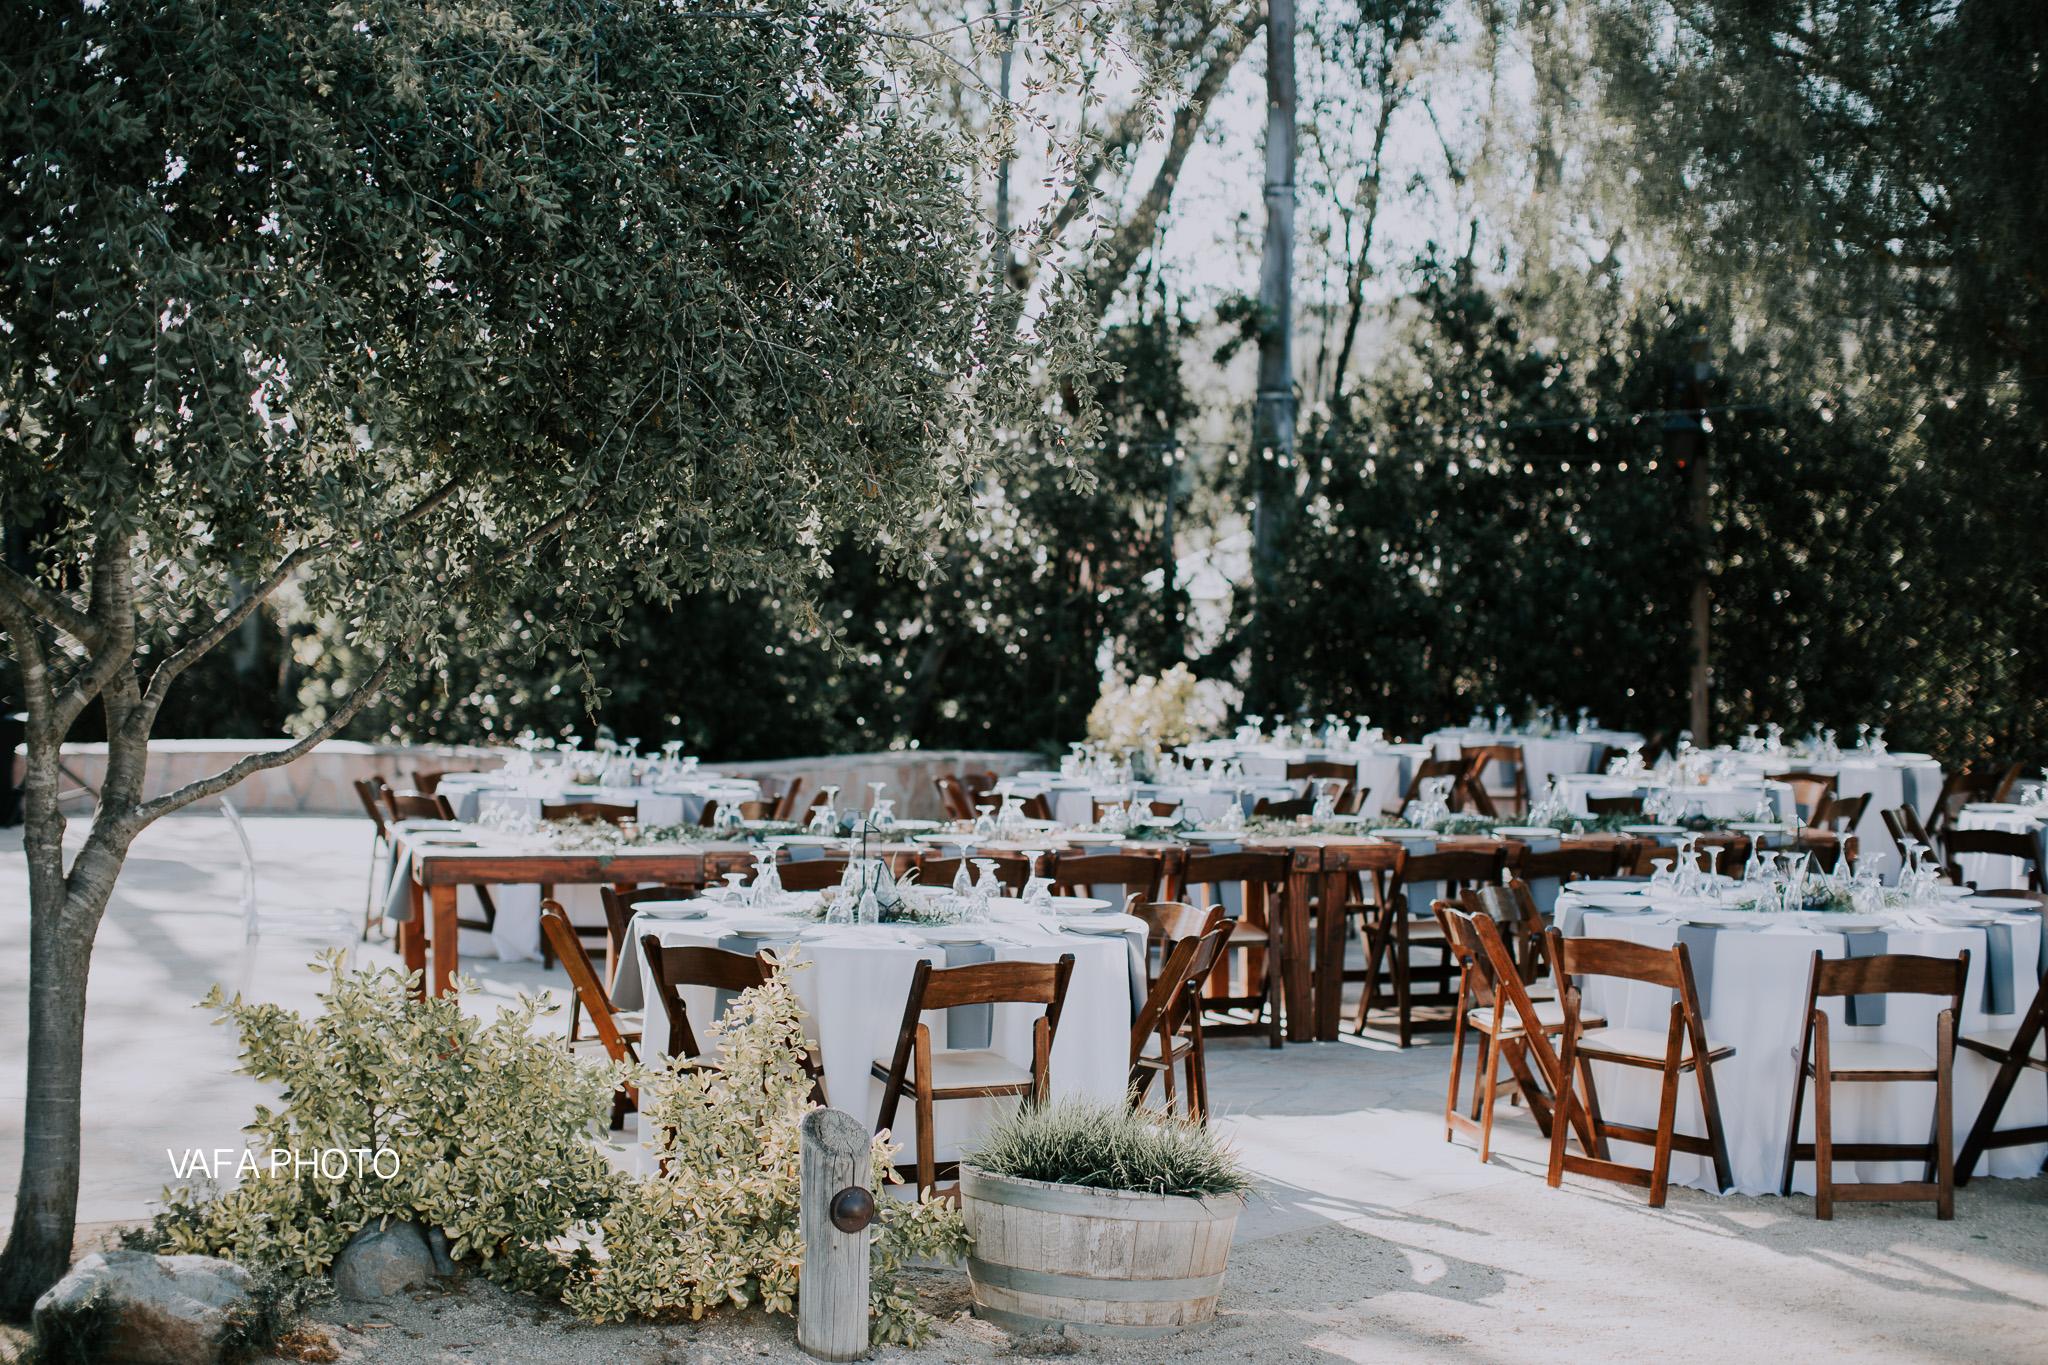 Leo-Carrillo-Ranch-Wedding-Lauren-Mike-Vafa-Photo-409.jpg